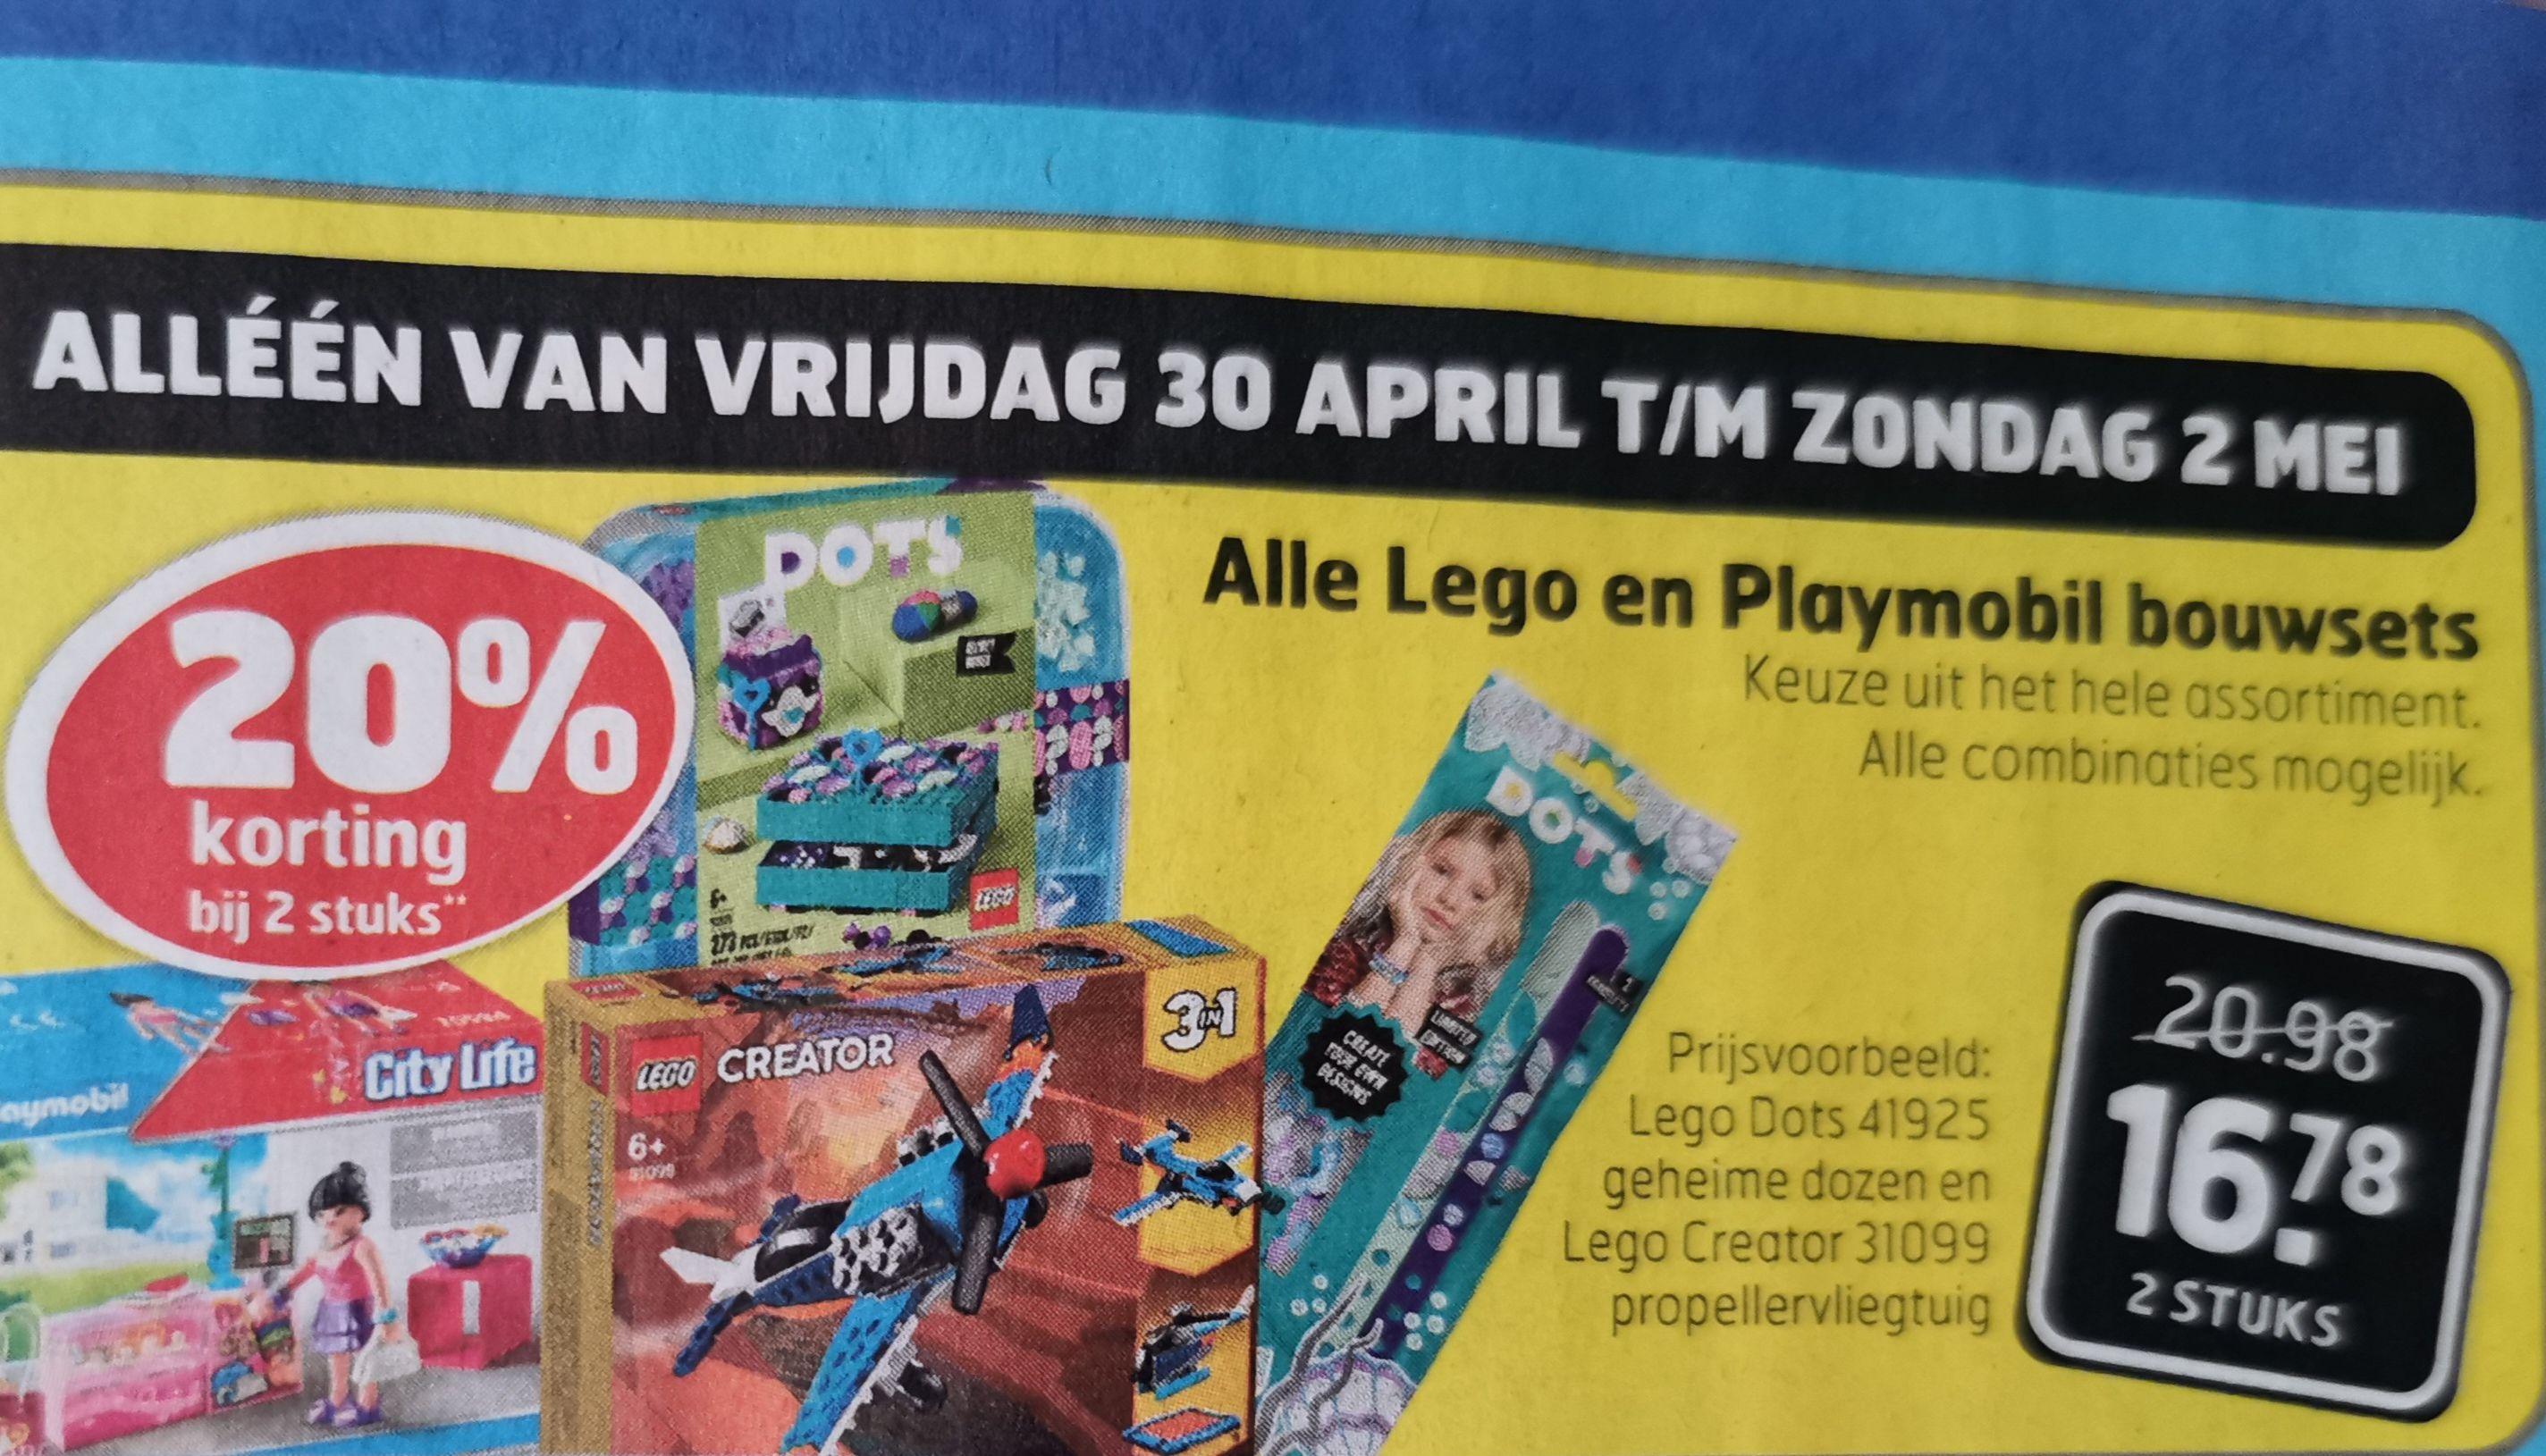 Alle LEGO en Playmobil bouwsets 20% korting